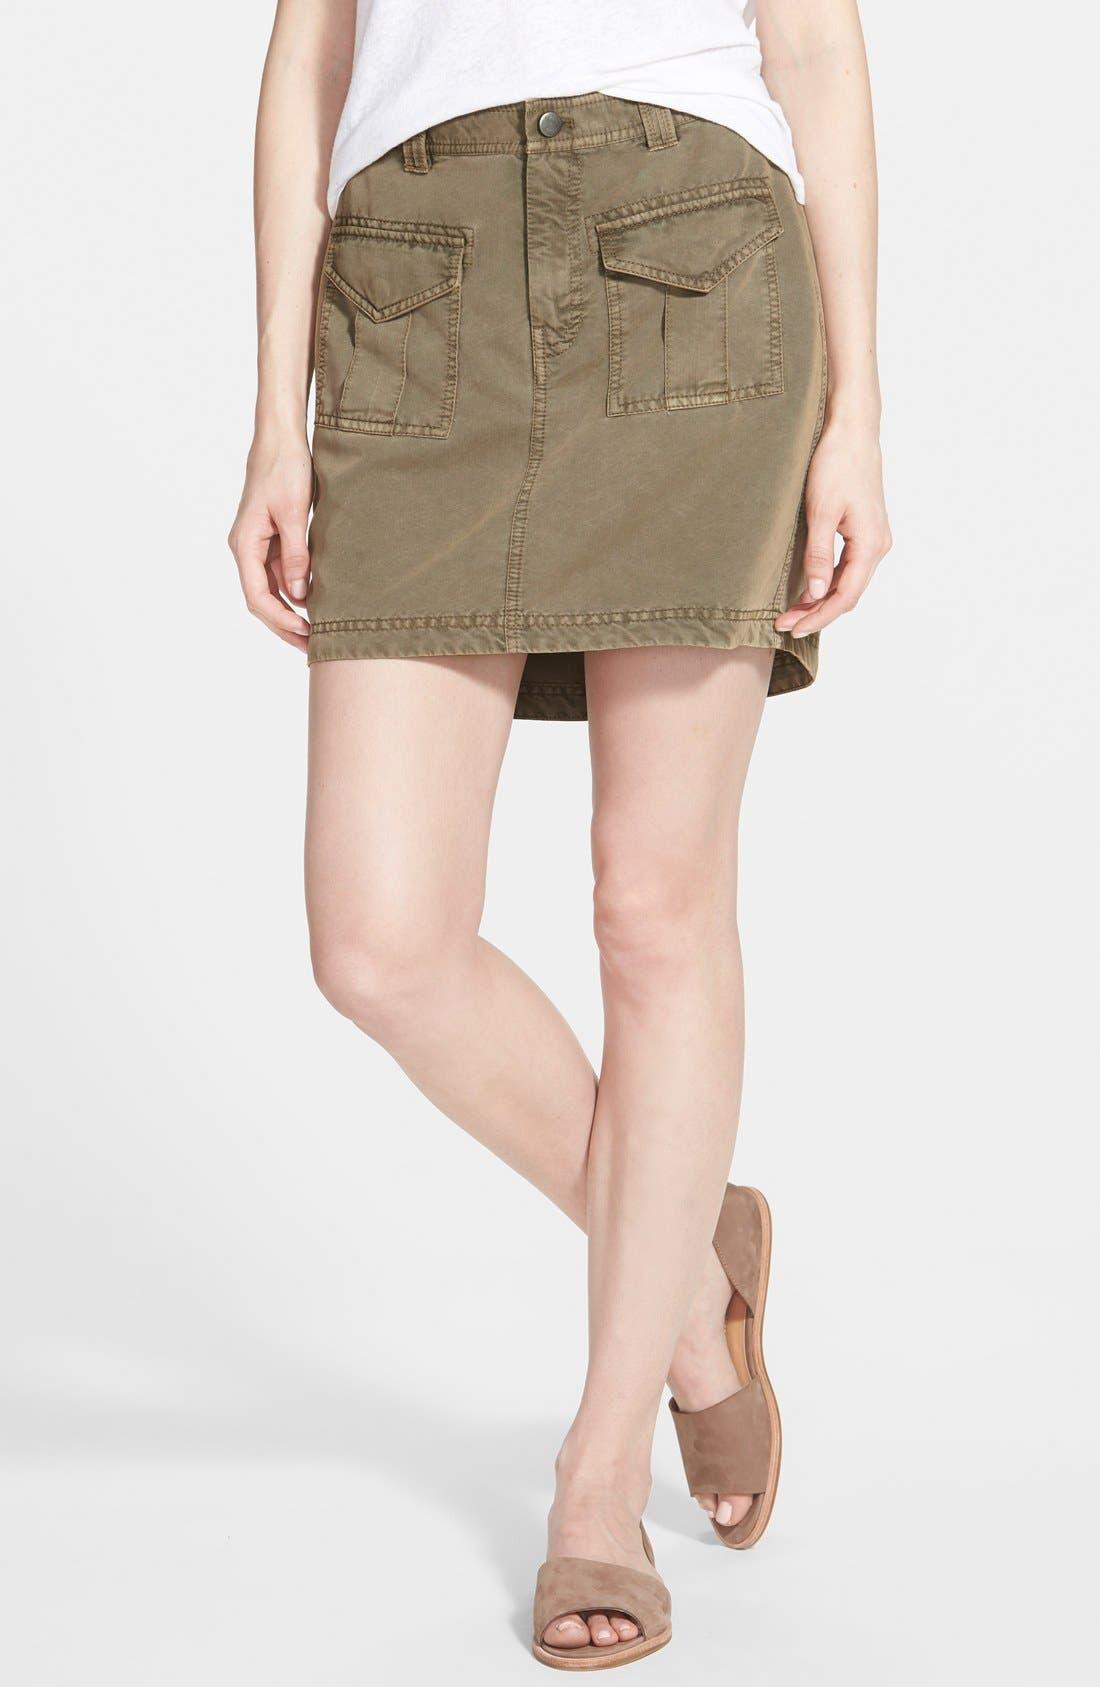 Alternate Image 1 Selected - Hinge Vintage Military Skirt